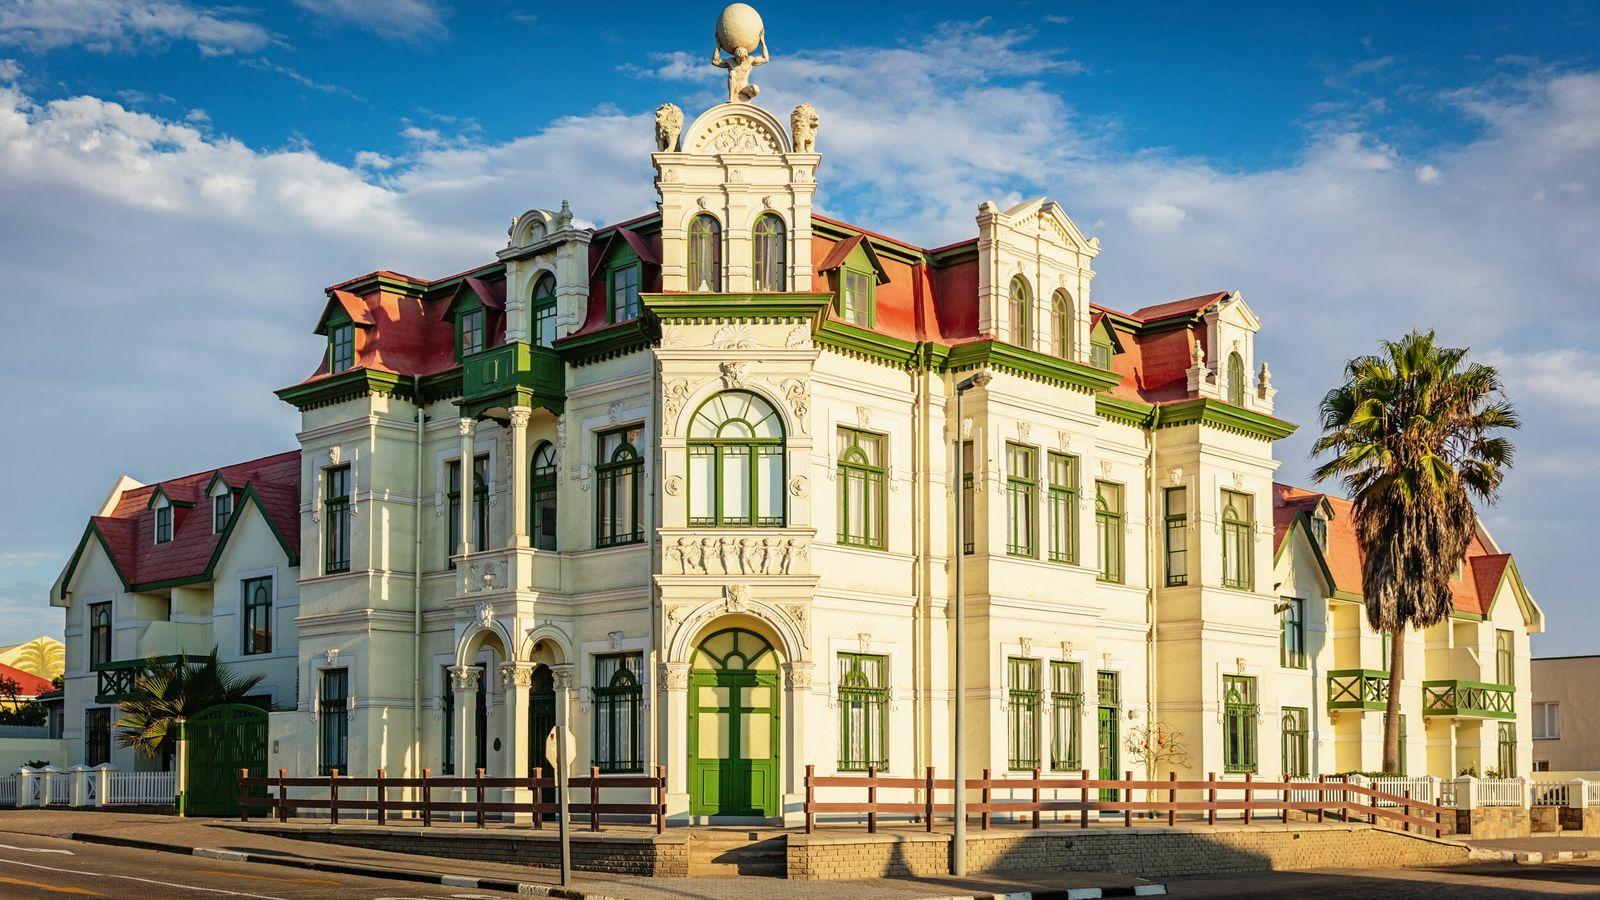 The colourful Hohenzollern Building, Swakopmund.